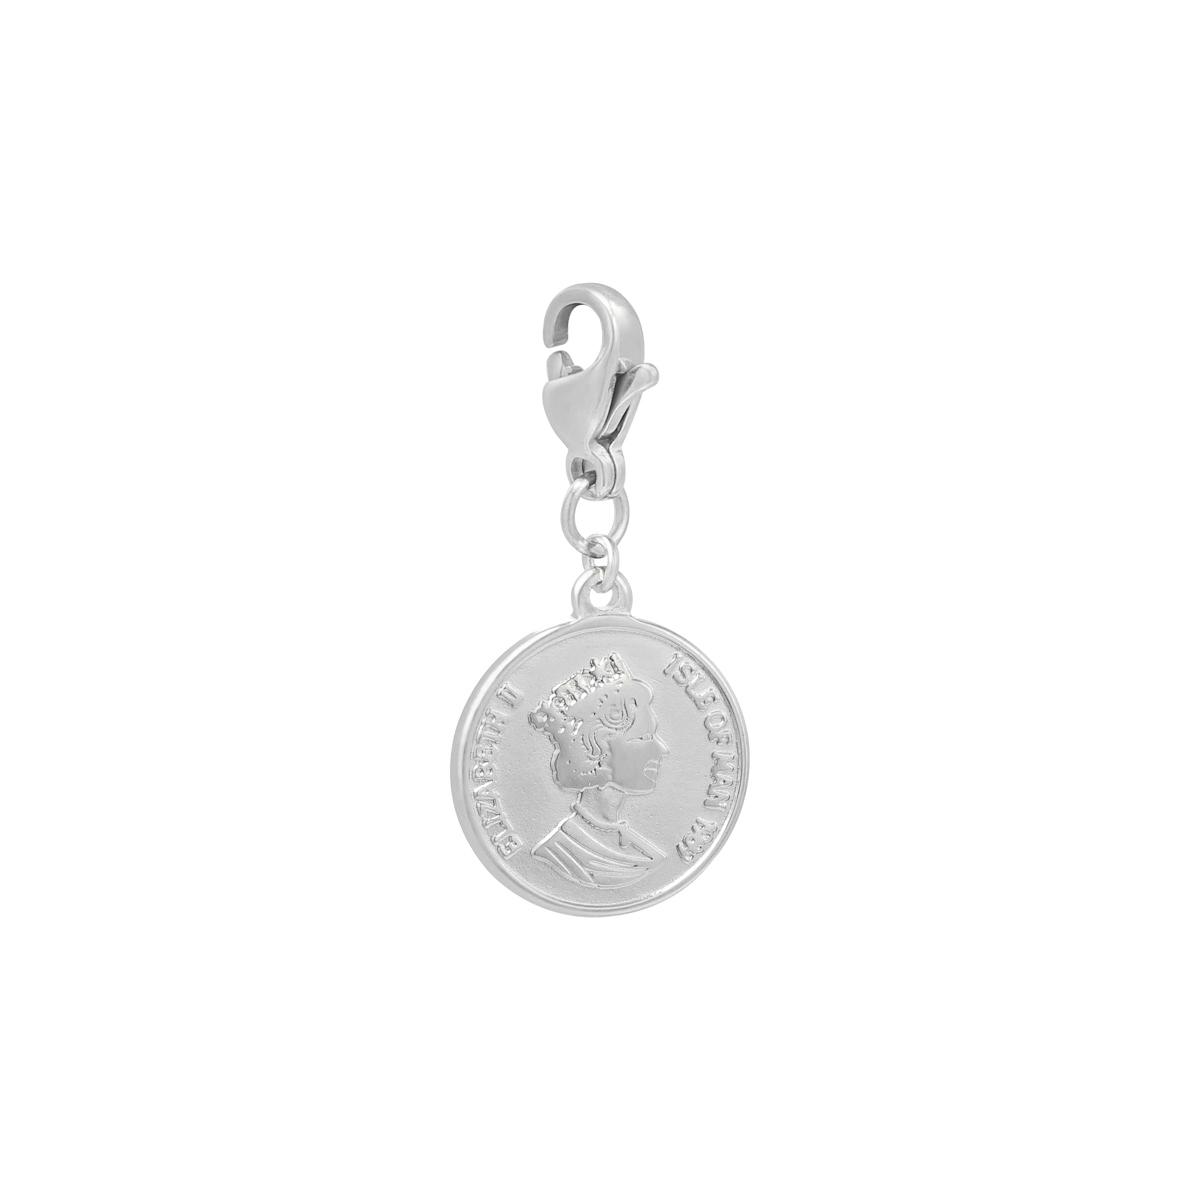 Diy clasp charm queen coin